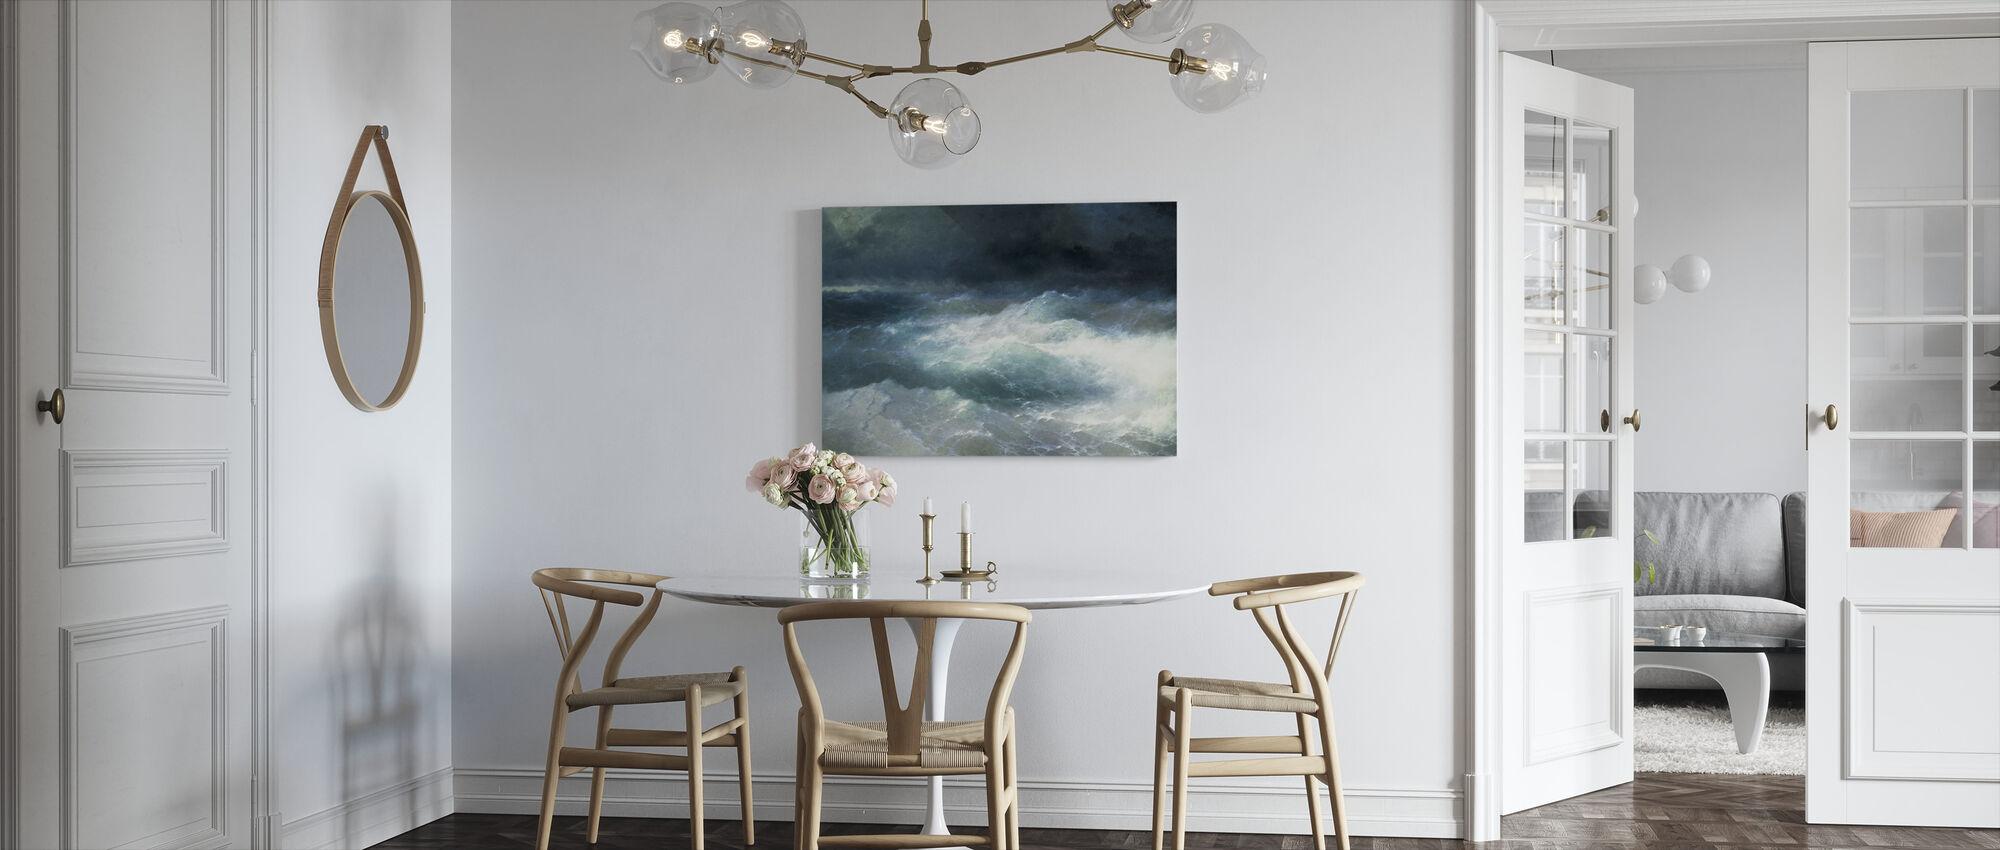 Between the Waves - Ivan Aivazovsky - Canvas print - Kitchen